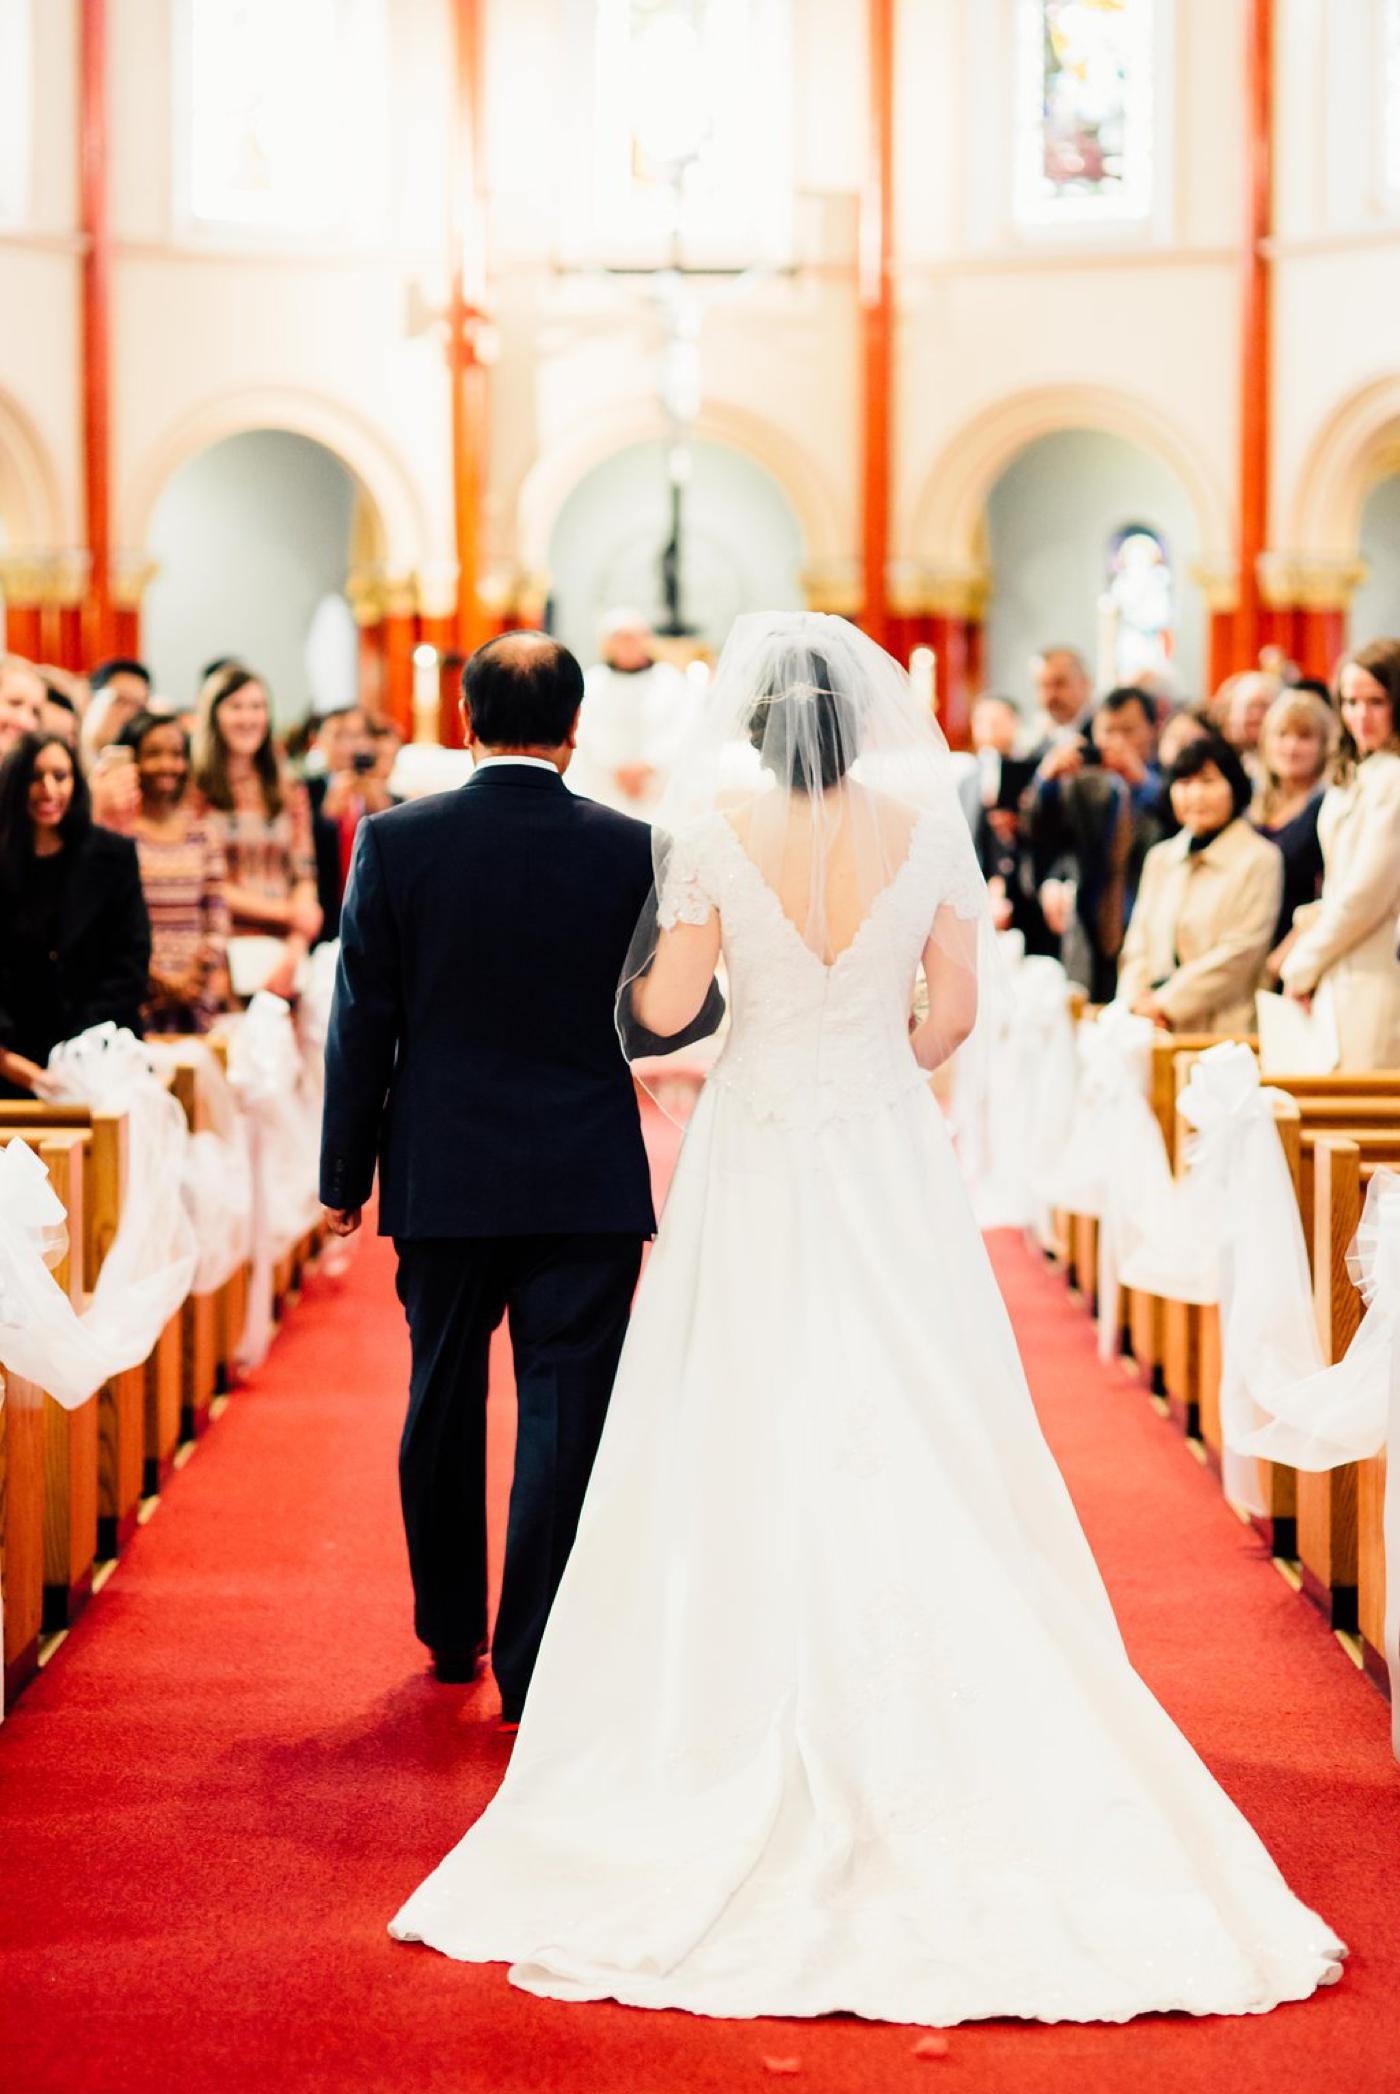 chicago-fine-art-wedding-photography-bolotin23